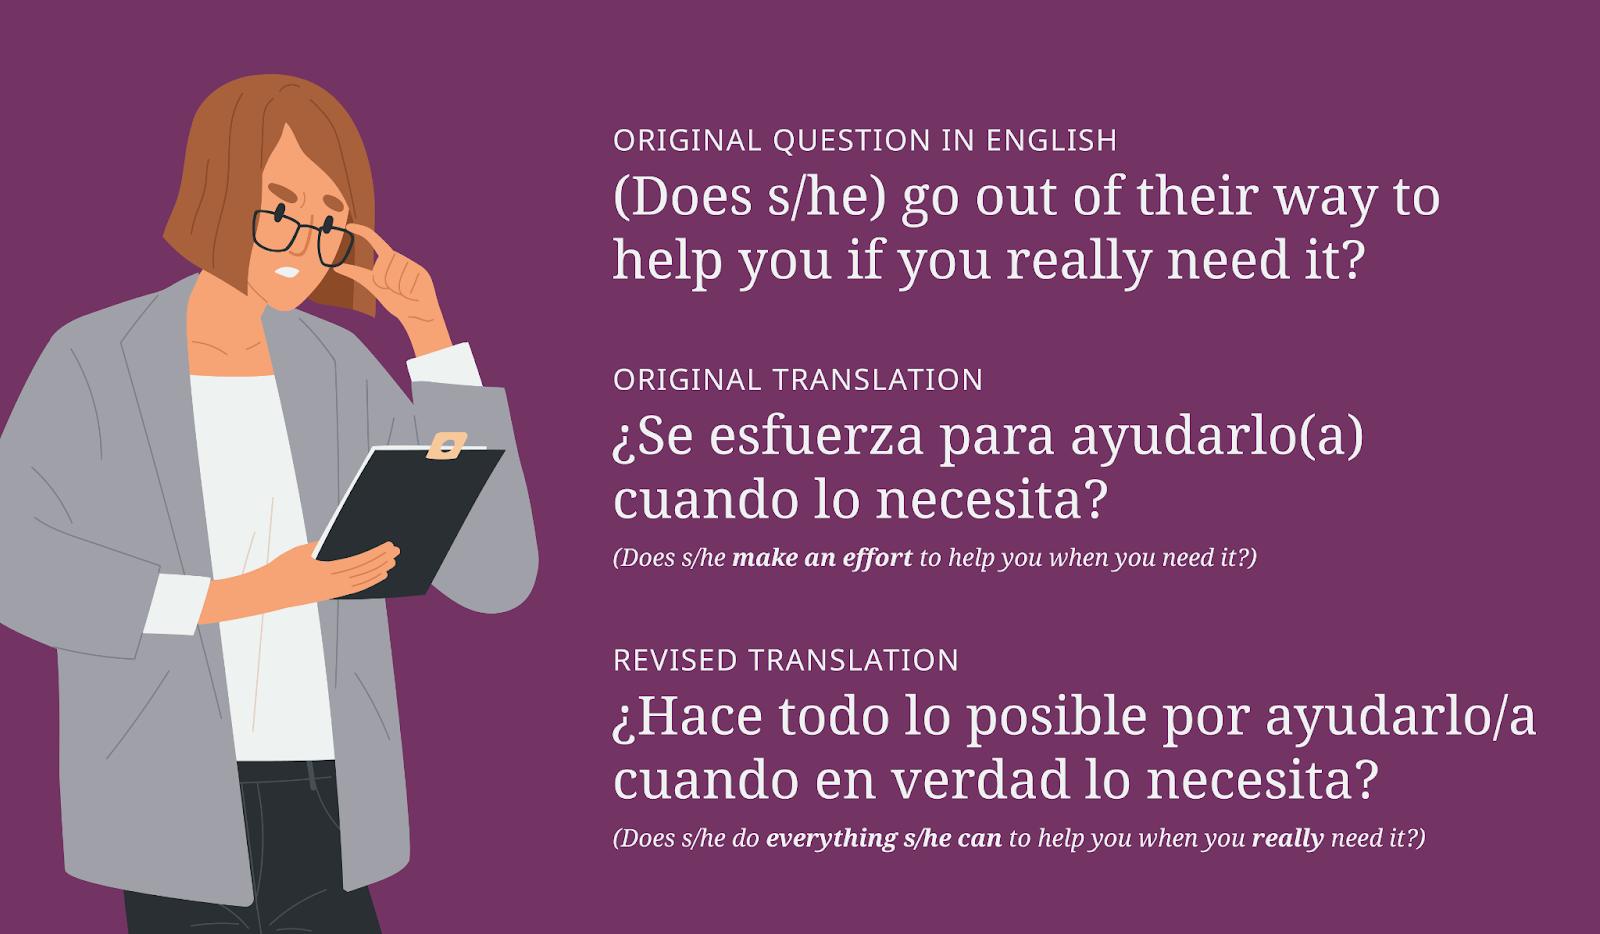 English to Spanish translation revisions